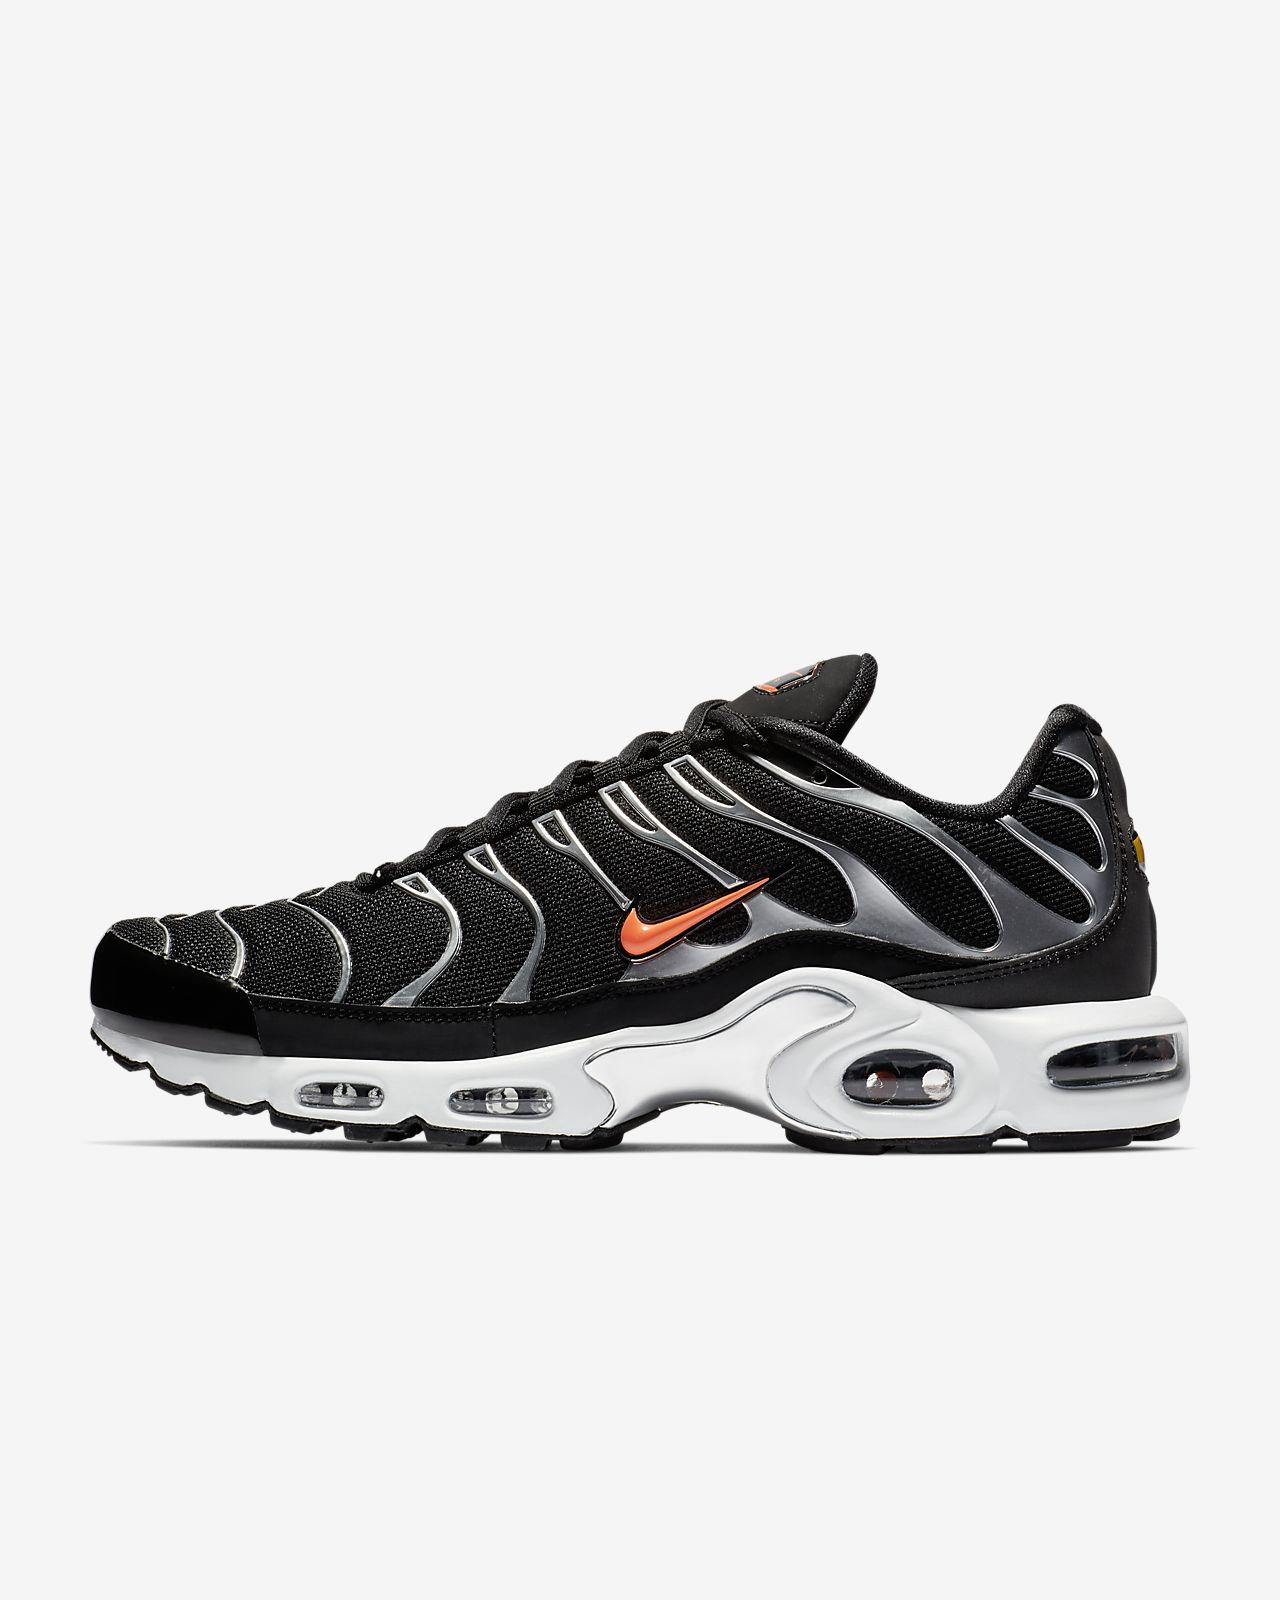 Мужские кроссовки Nike Air Max Plus TN SE